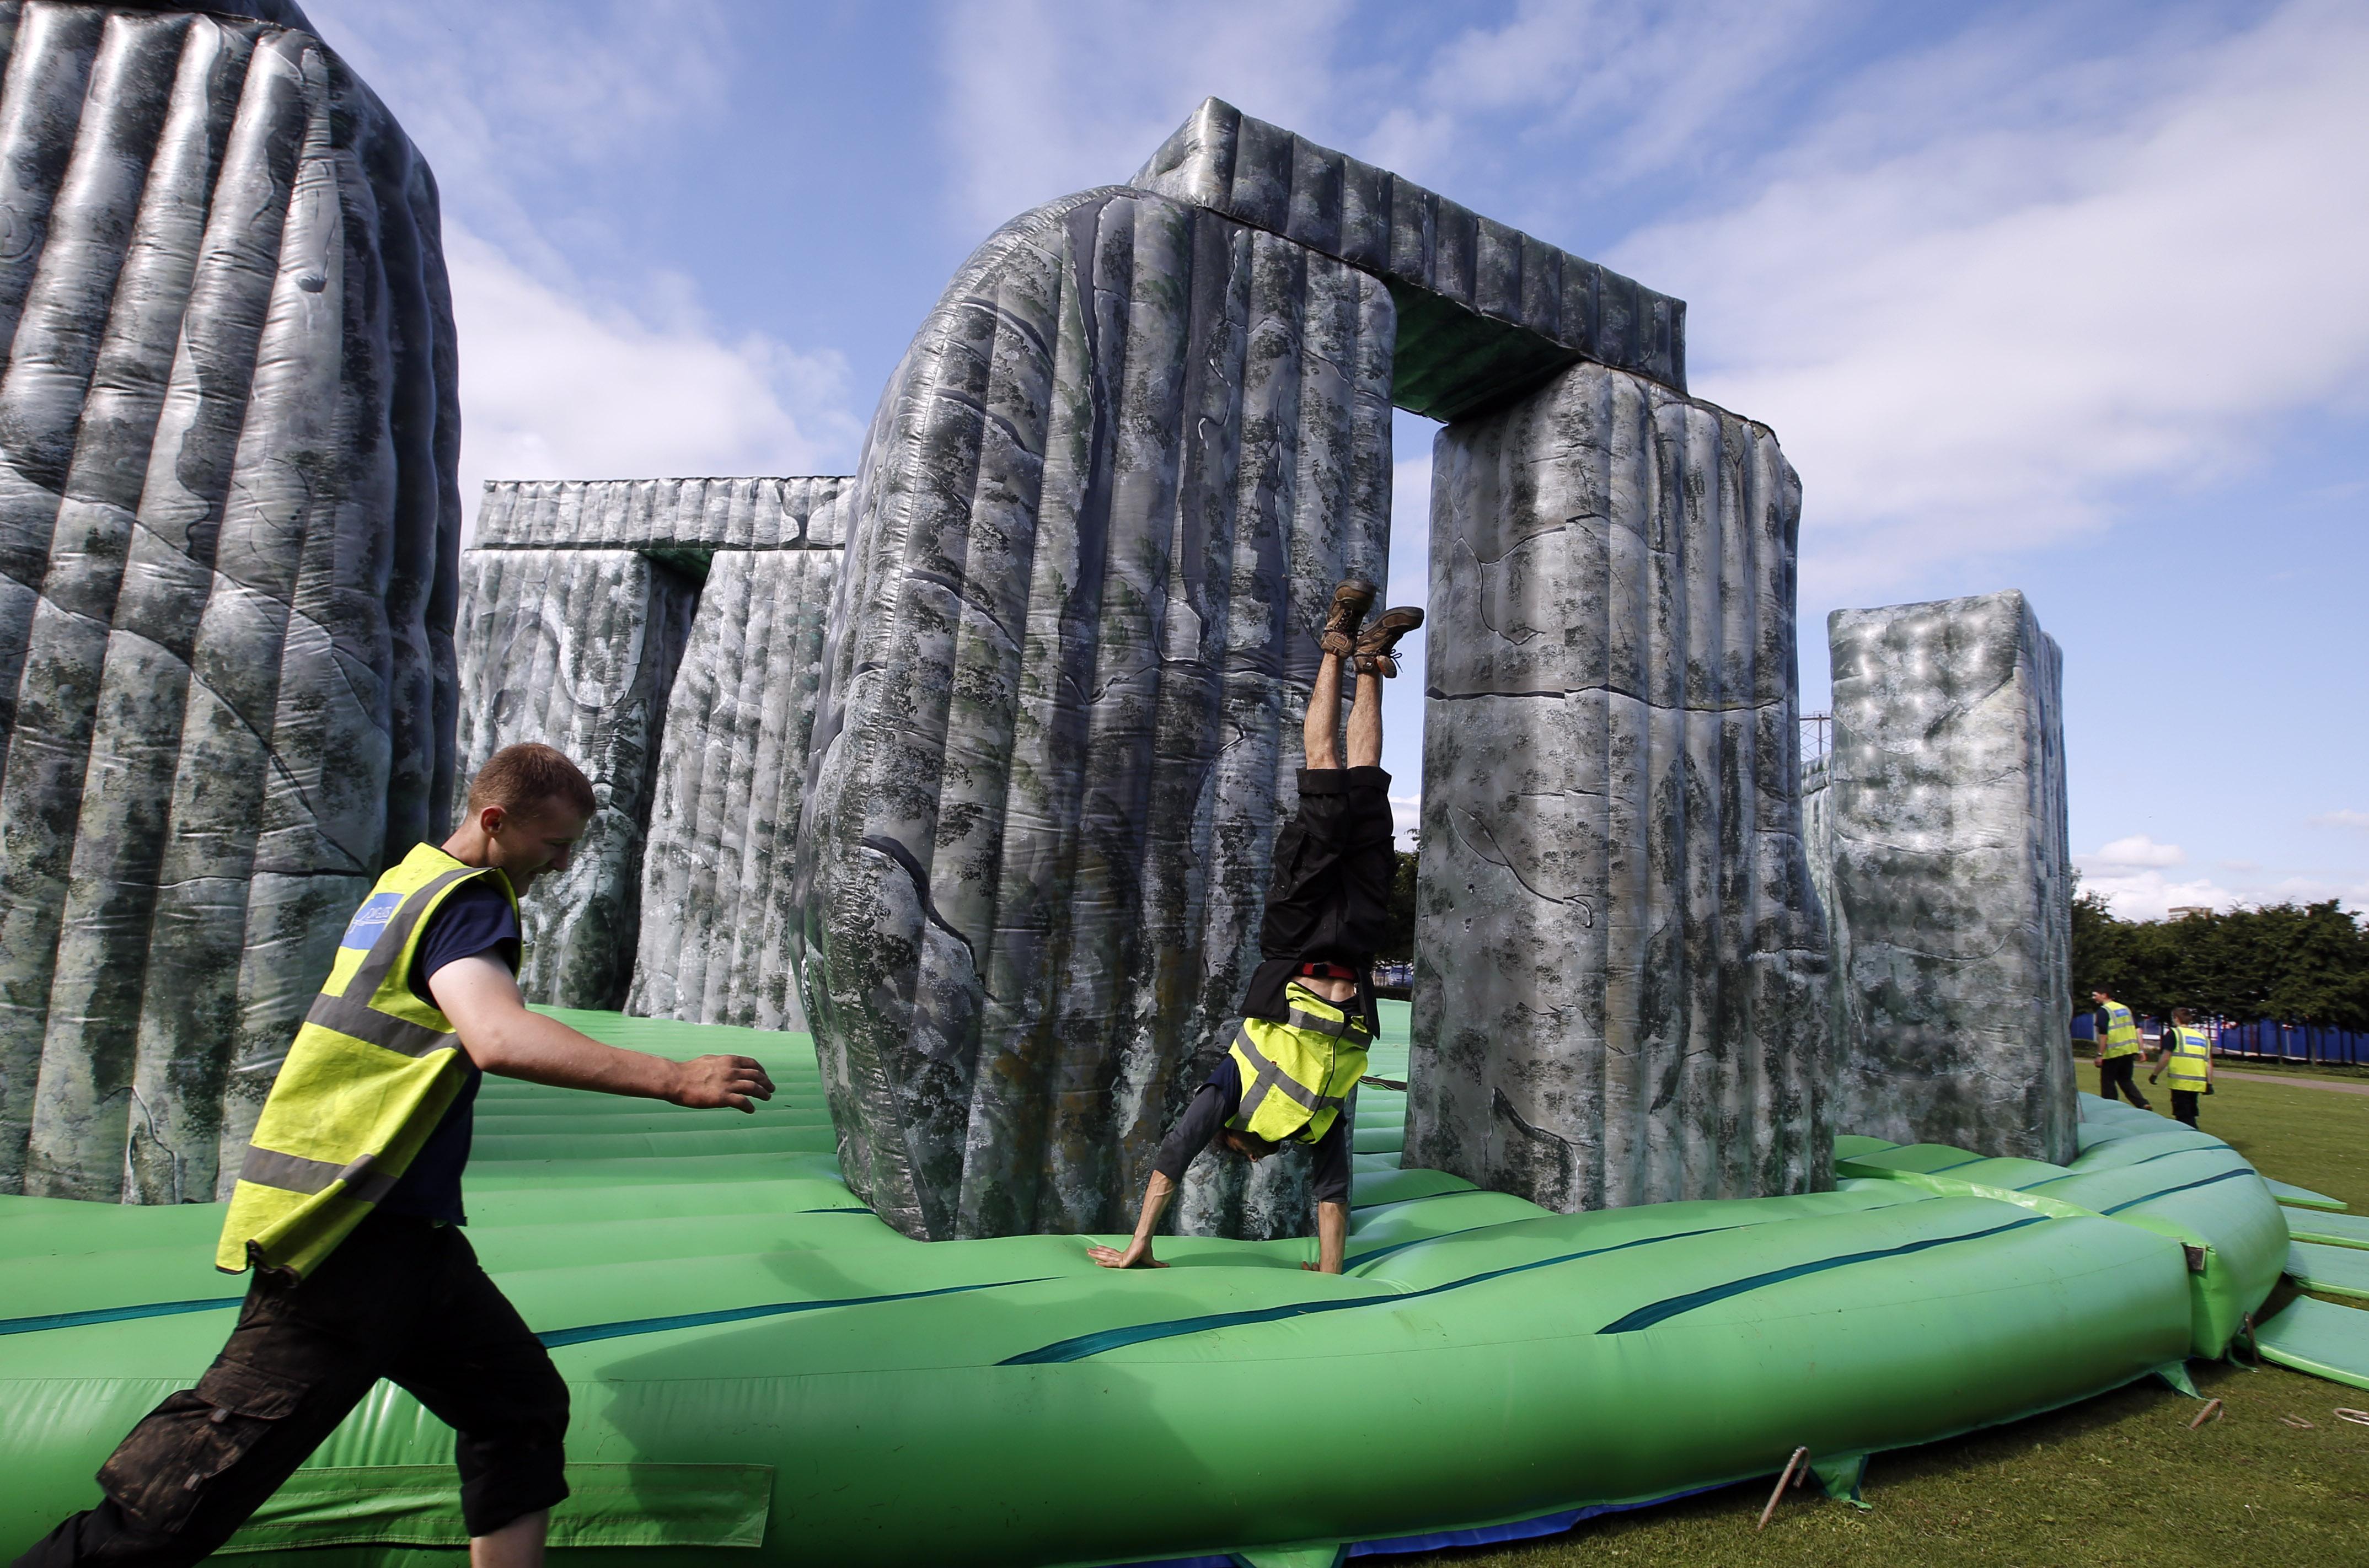 London 2012 Olympics (Stonehenge)